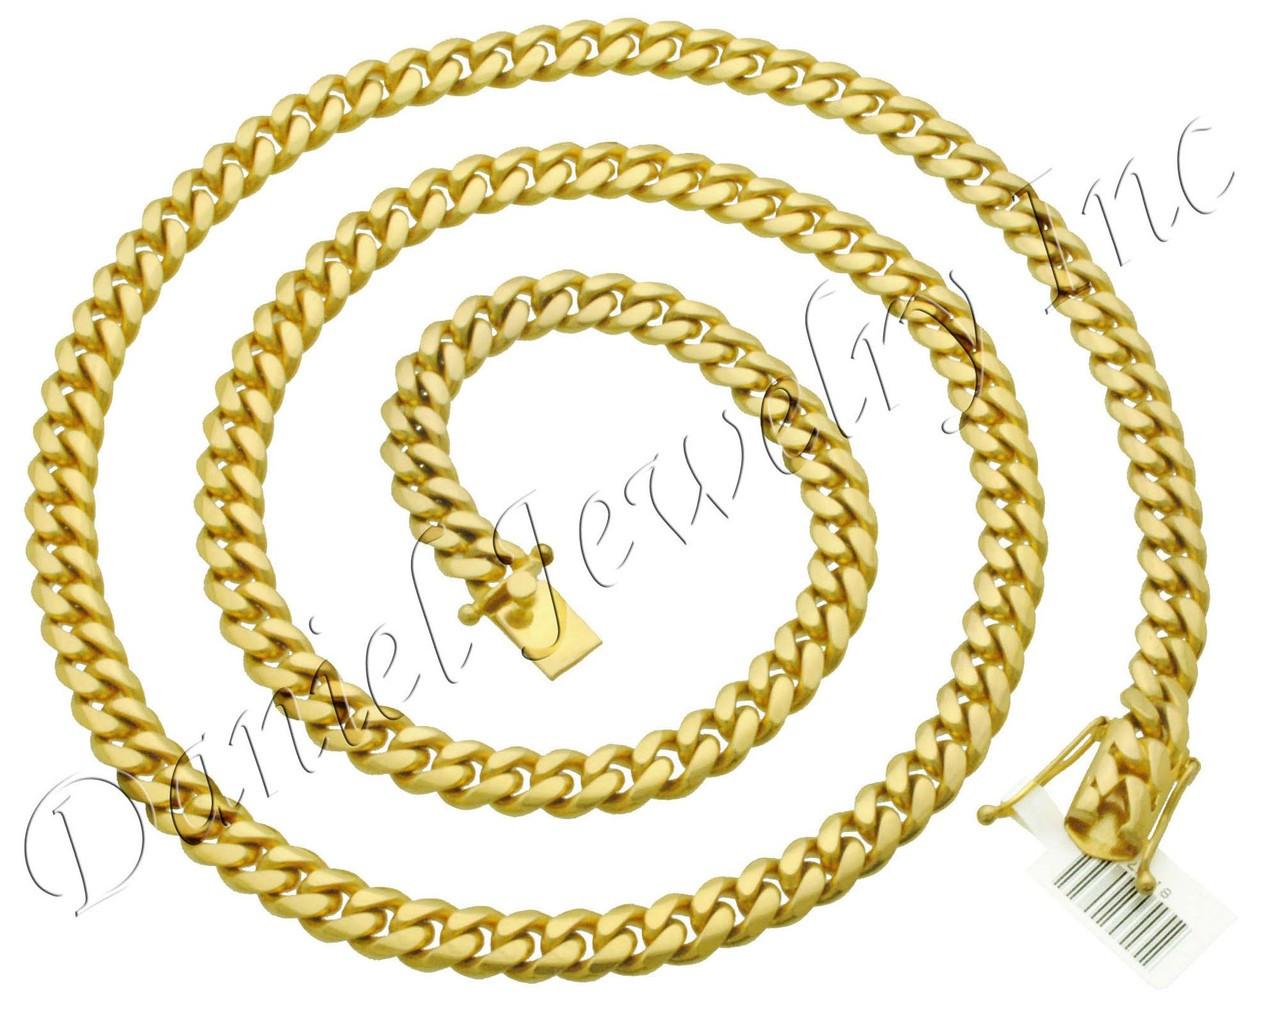 10k Gold Cuban Link Chain >> 8mm Miami Cuban Link 10k Chain